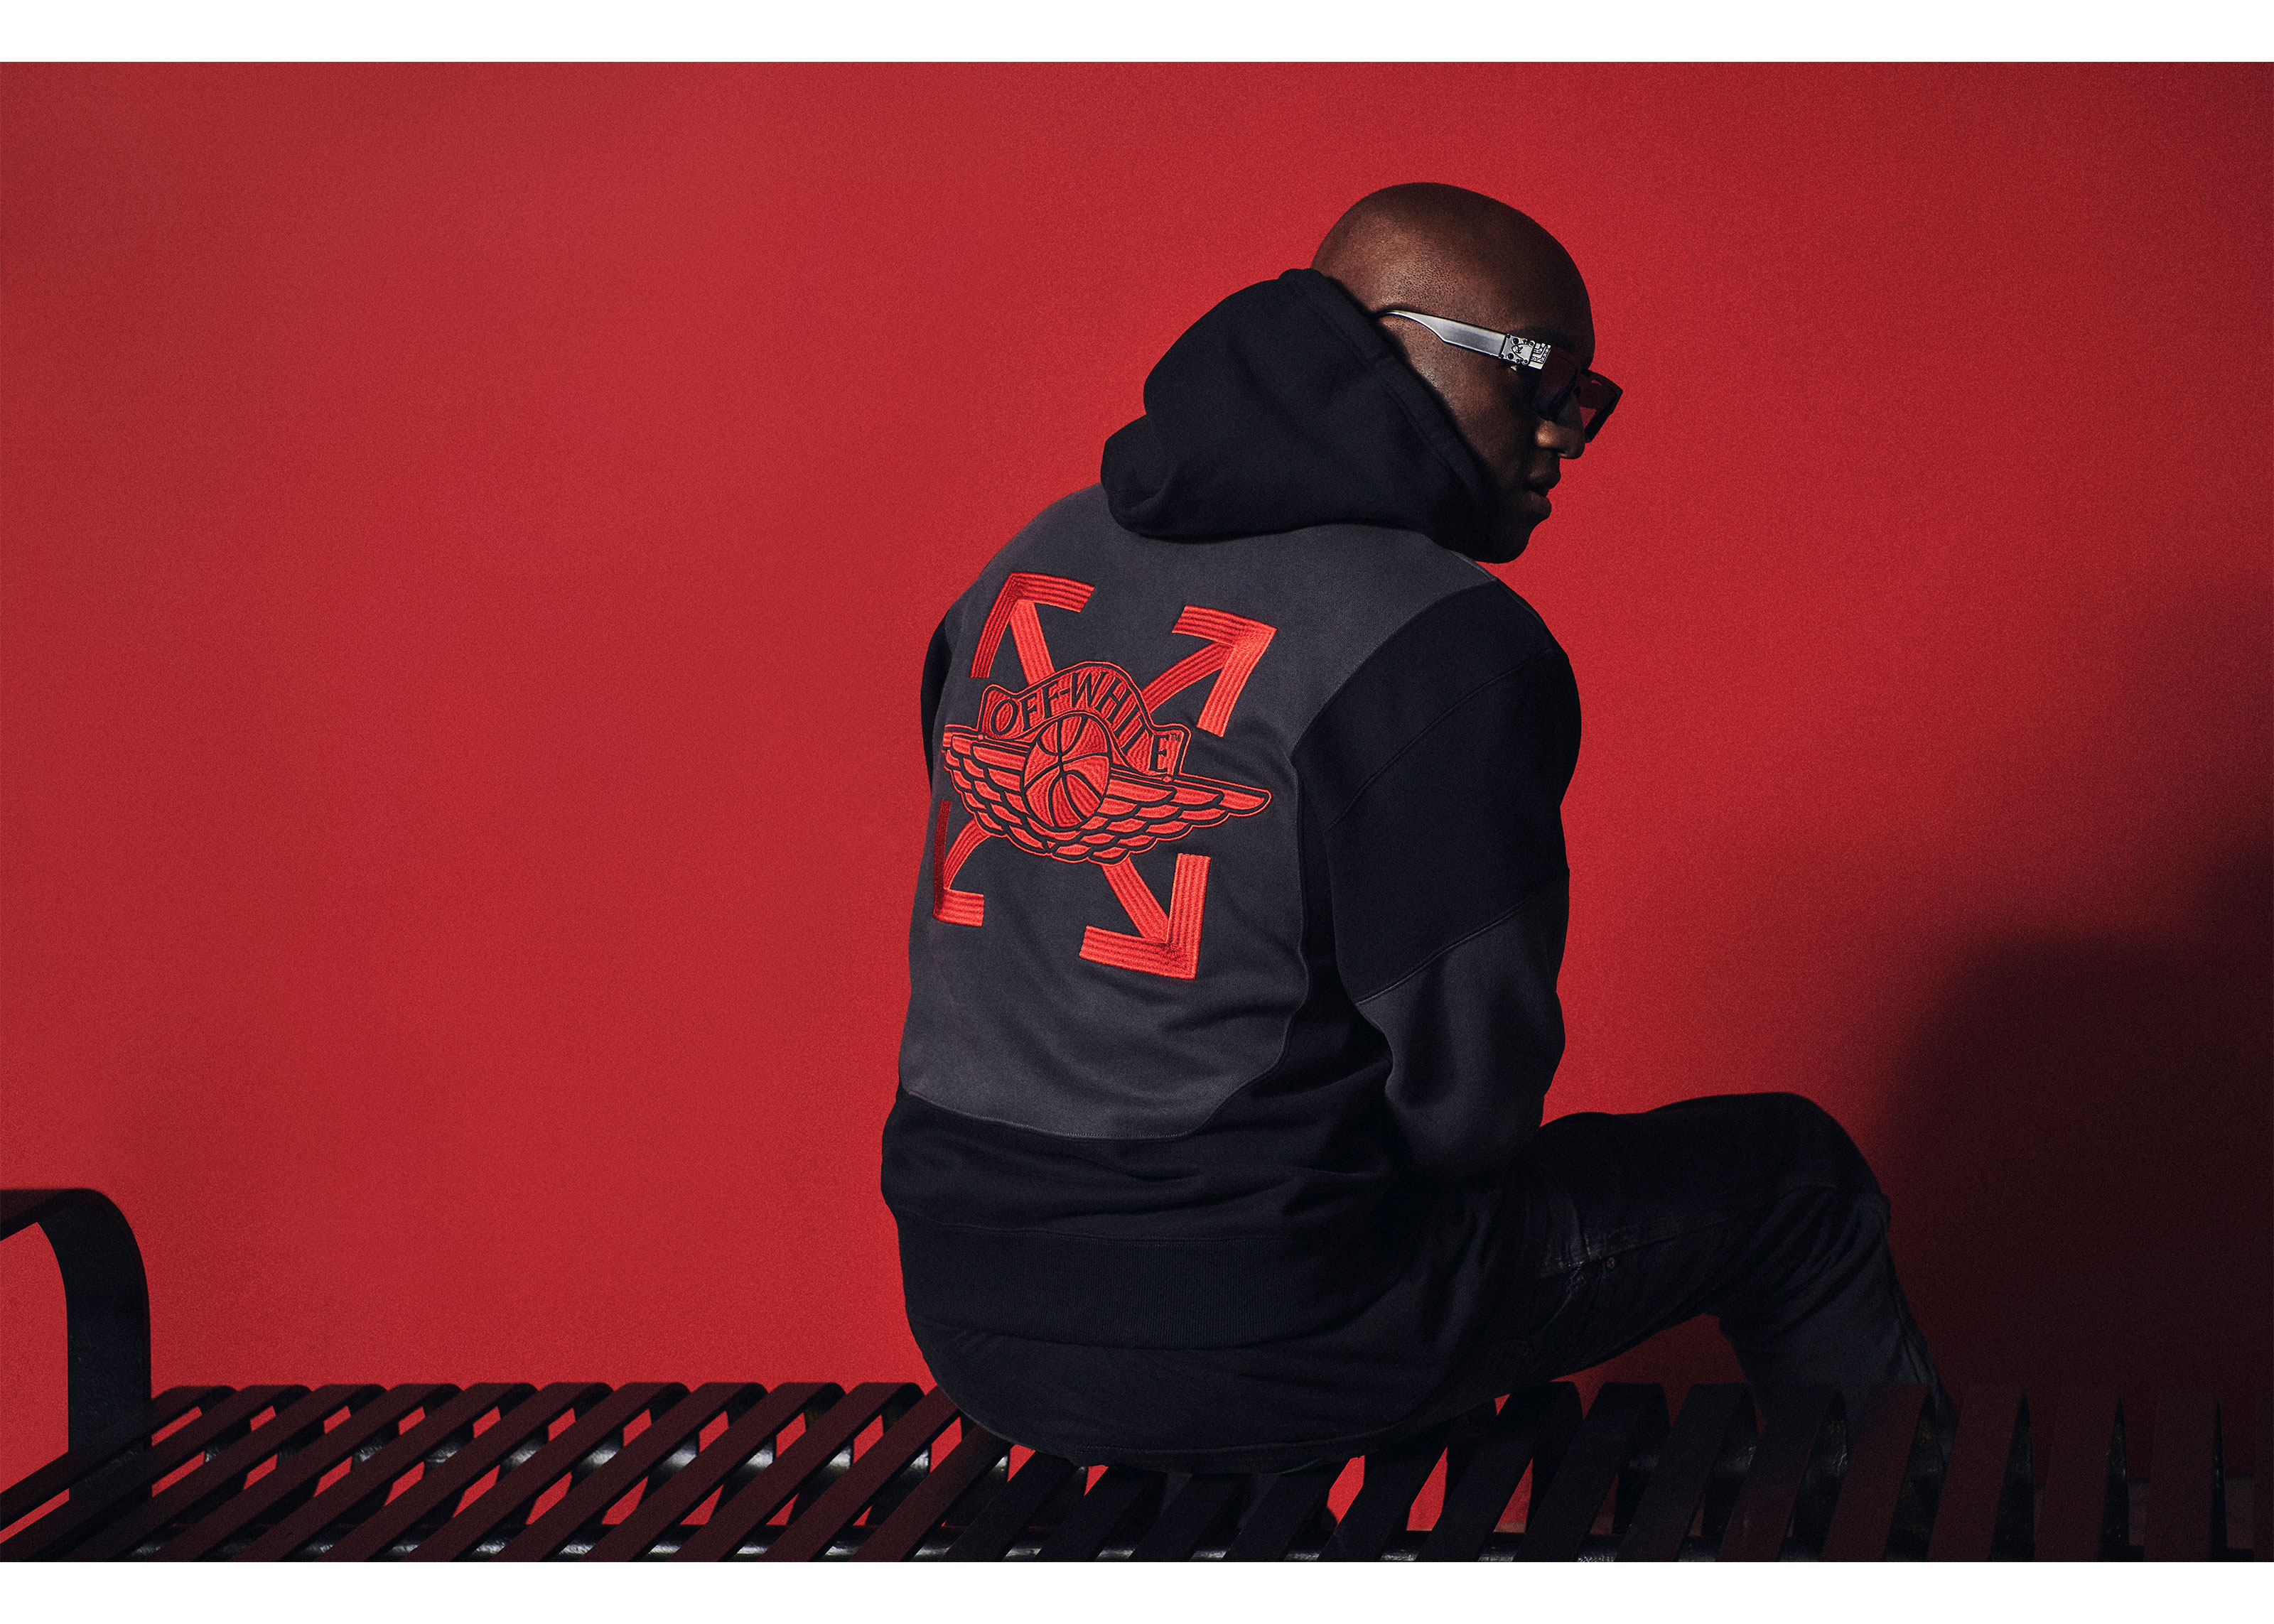 Virgil Abloh Reveals New Sneaker Box Design for His Nike Collaboration